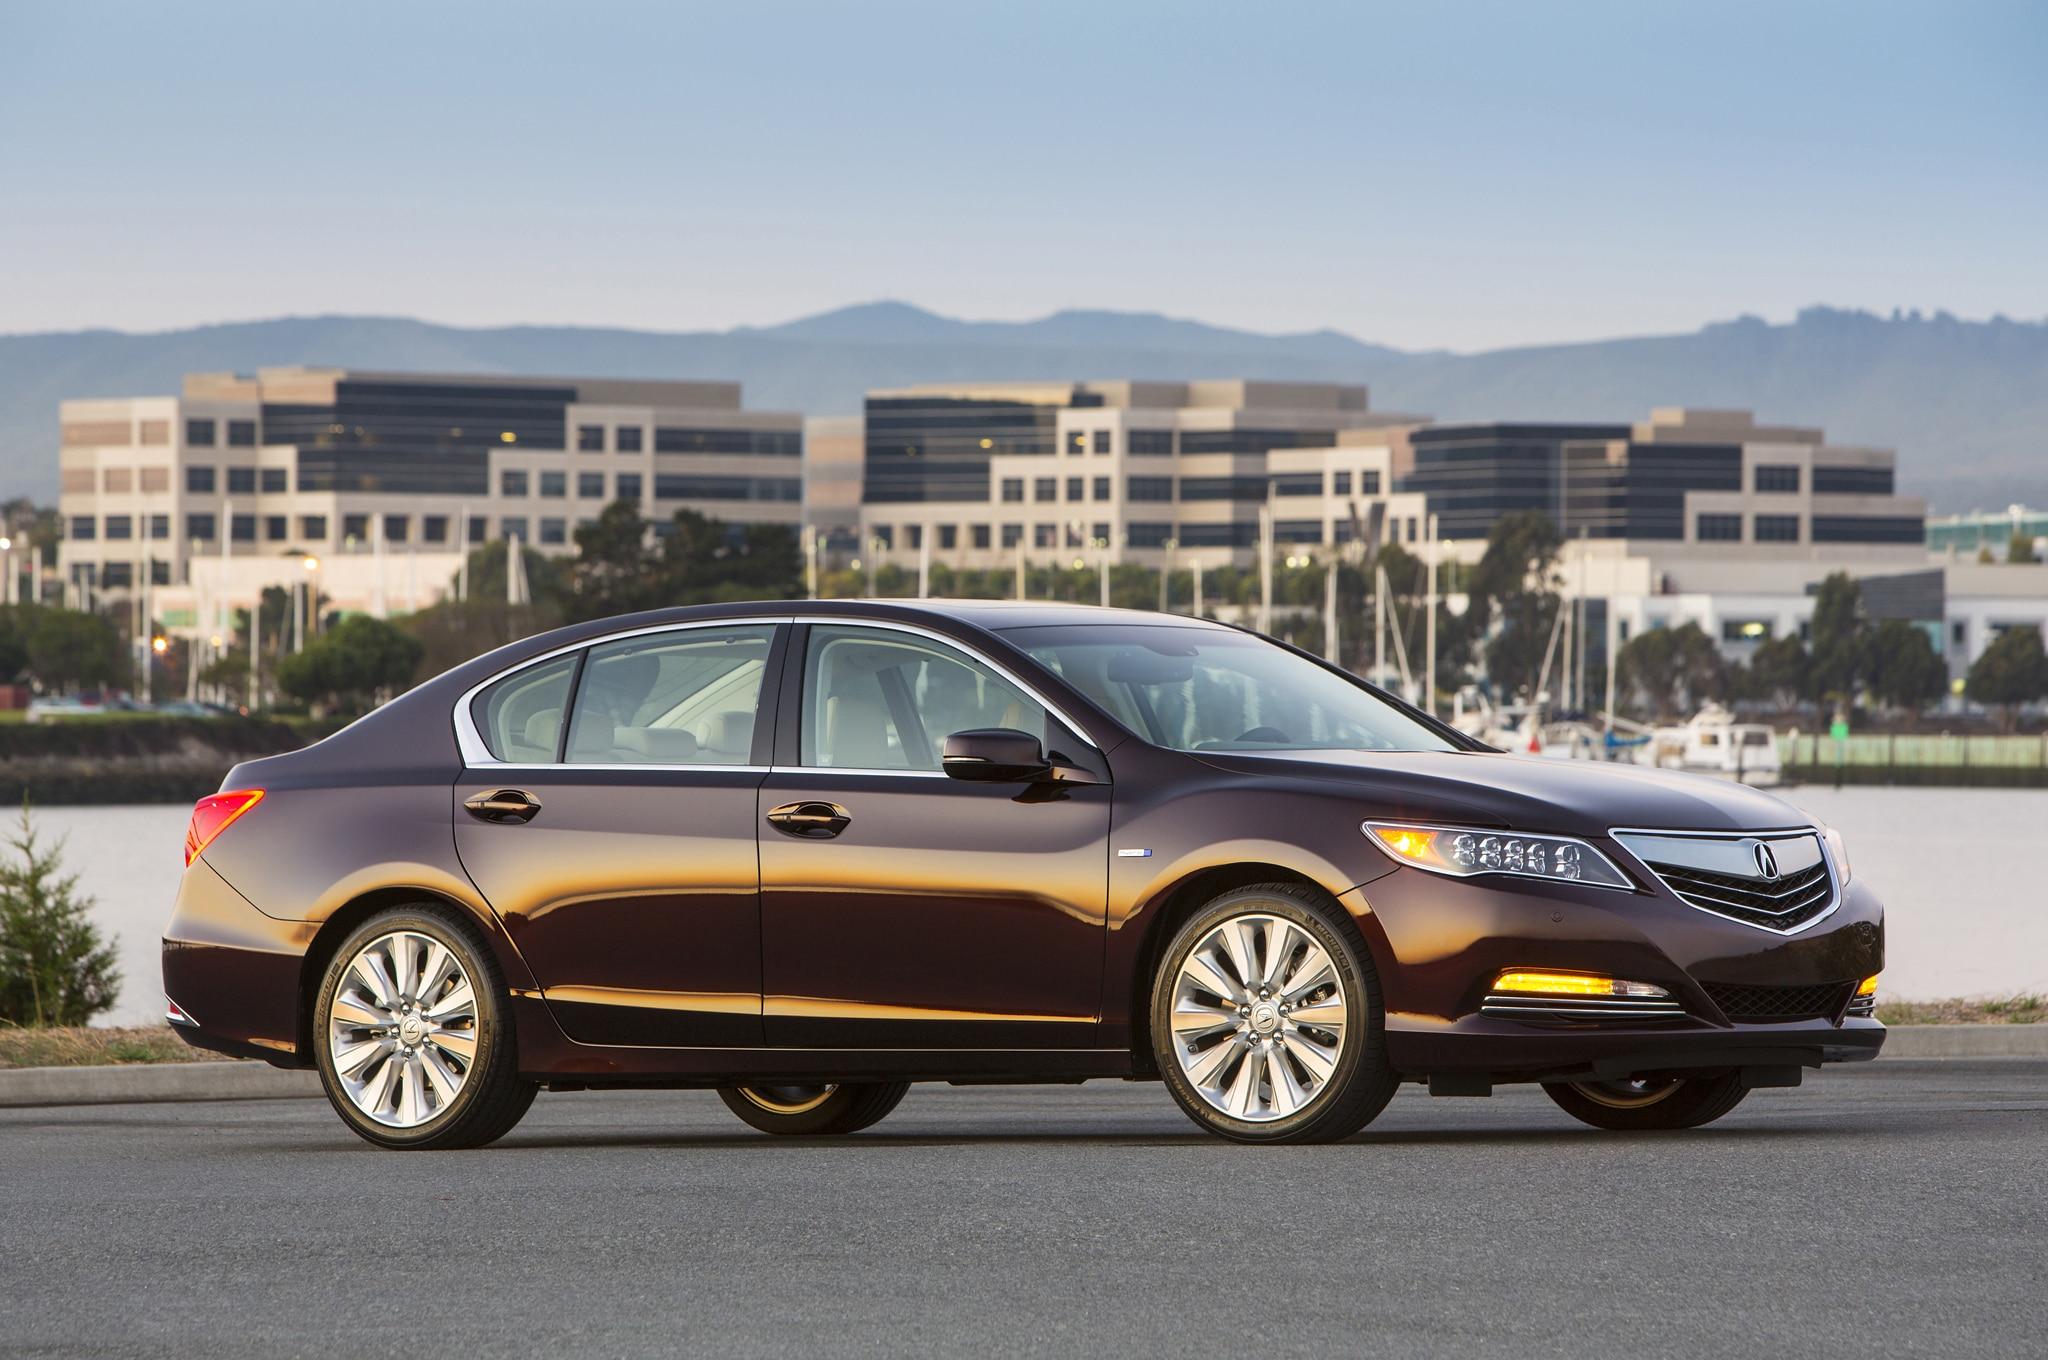 2014 Acura RLX Sport Hybrid SH-AWD Review